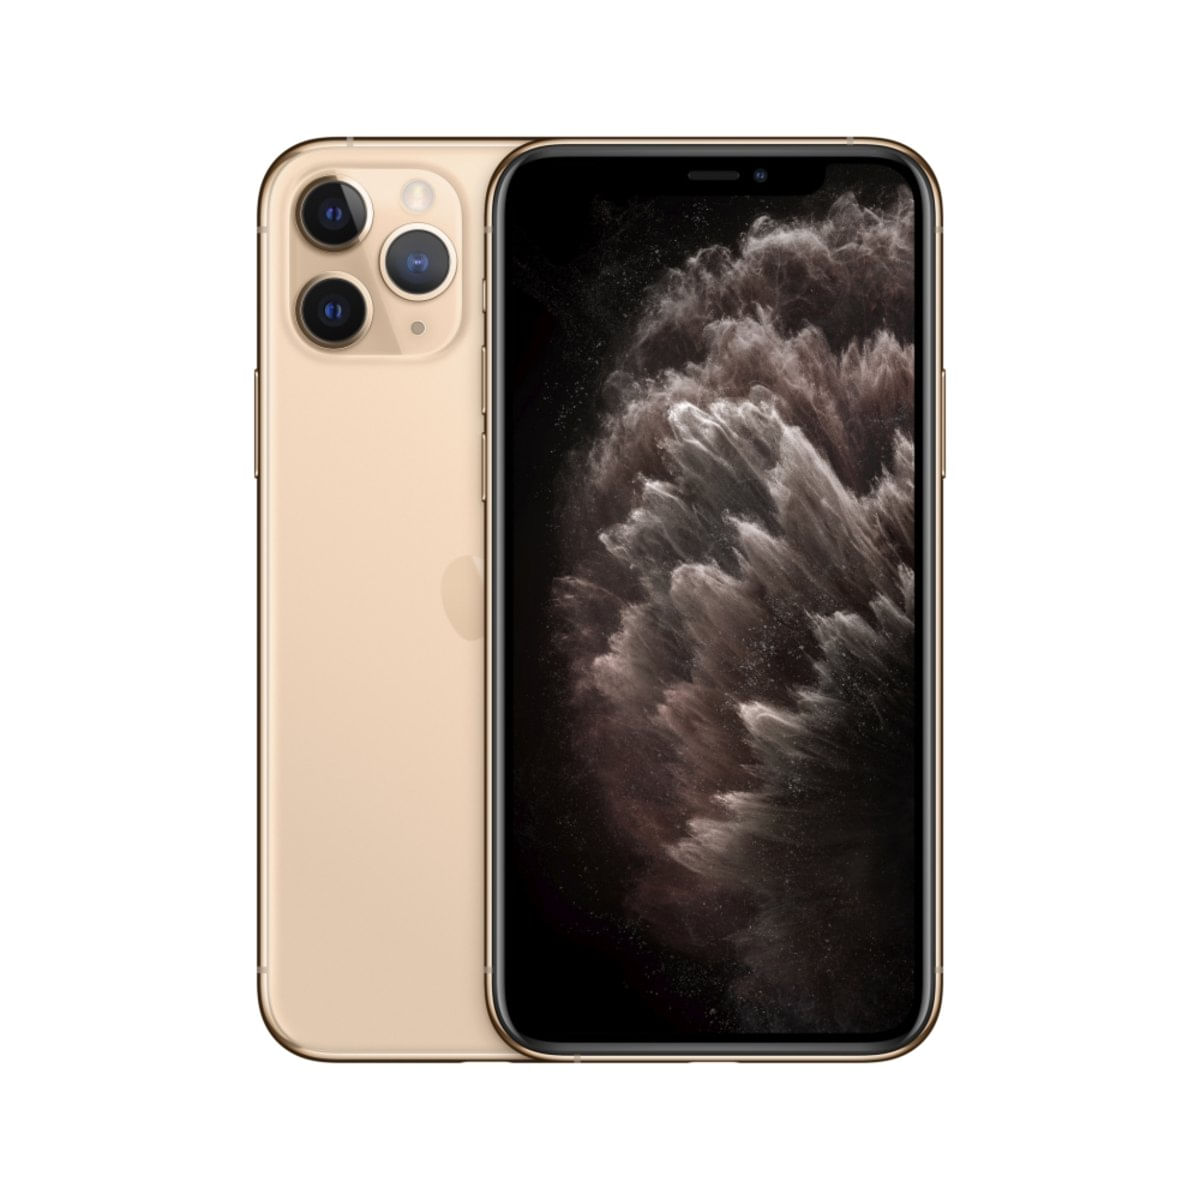 Celular Smartphone Apple iPhone 11 Pro 256gb Dourado - 1 Chip